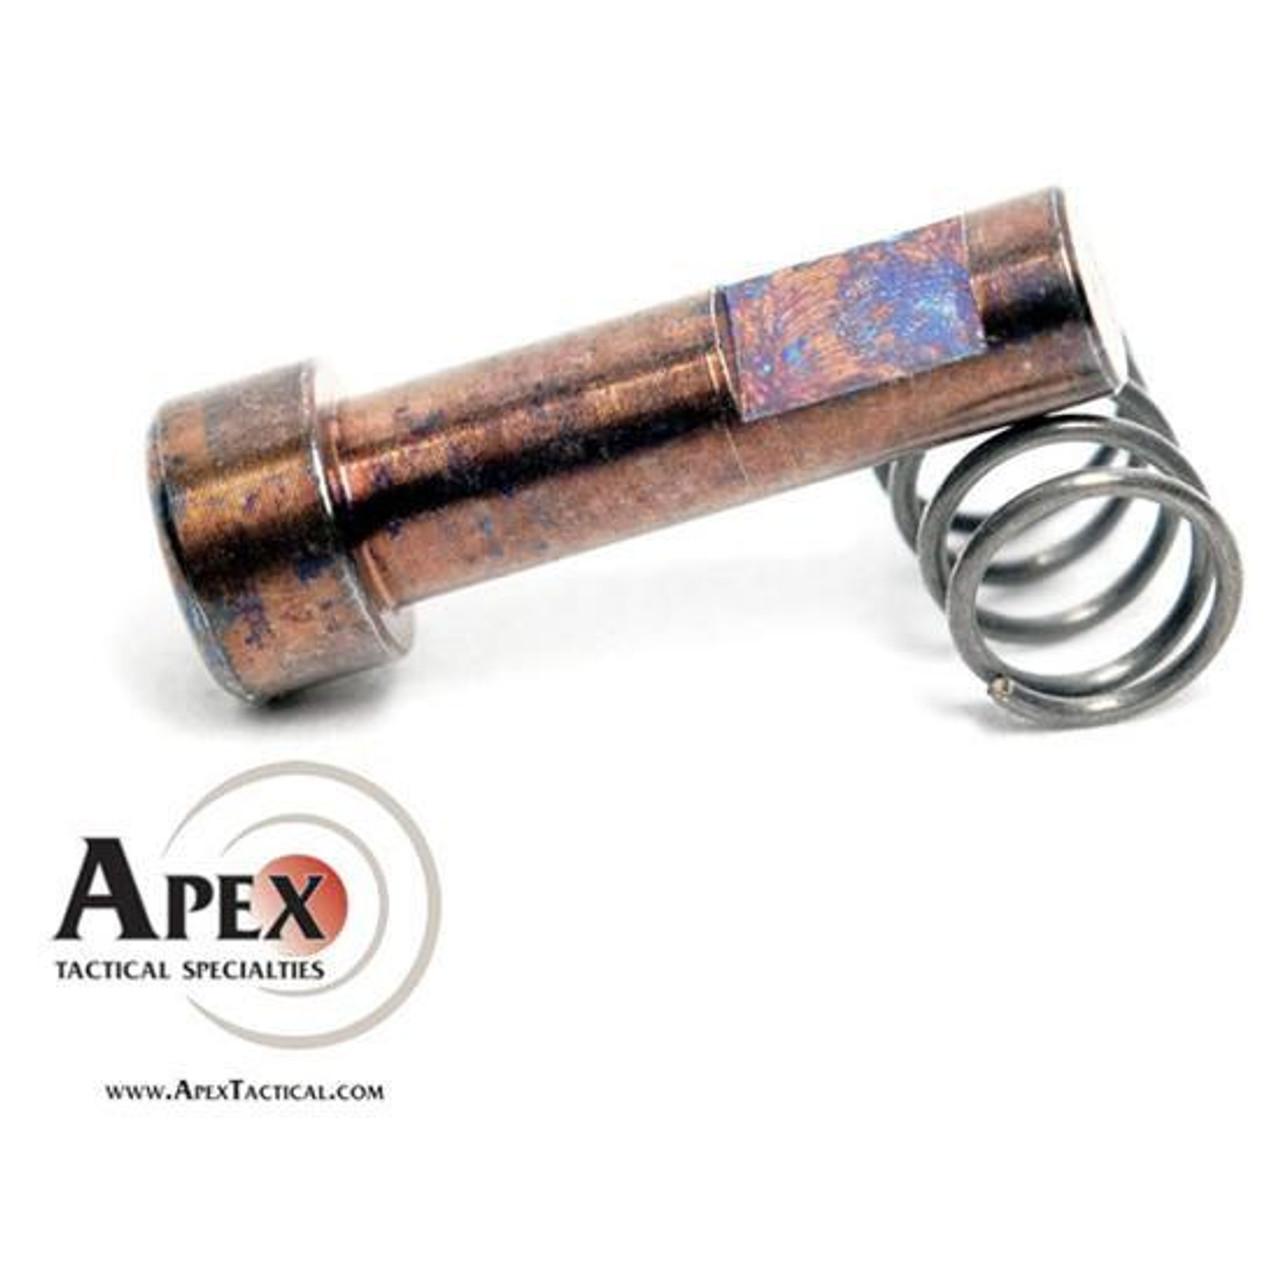 Apex Reset Assist Mechanism (RAM)